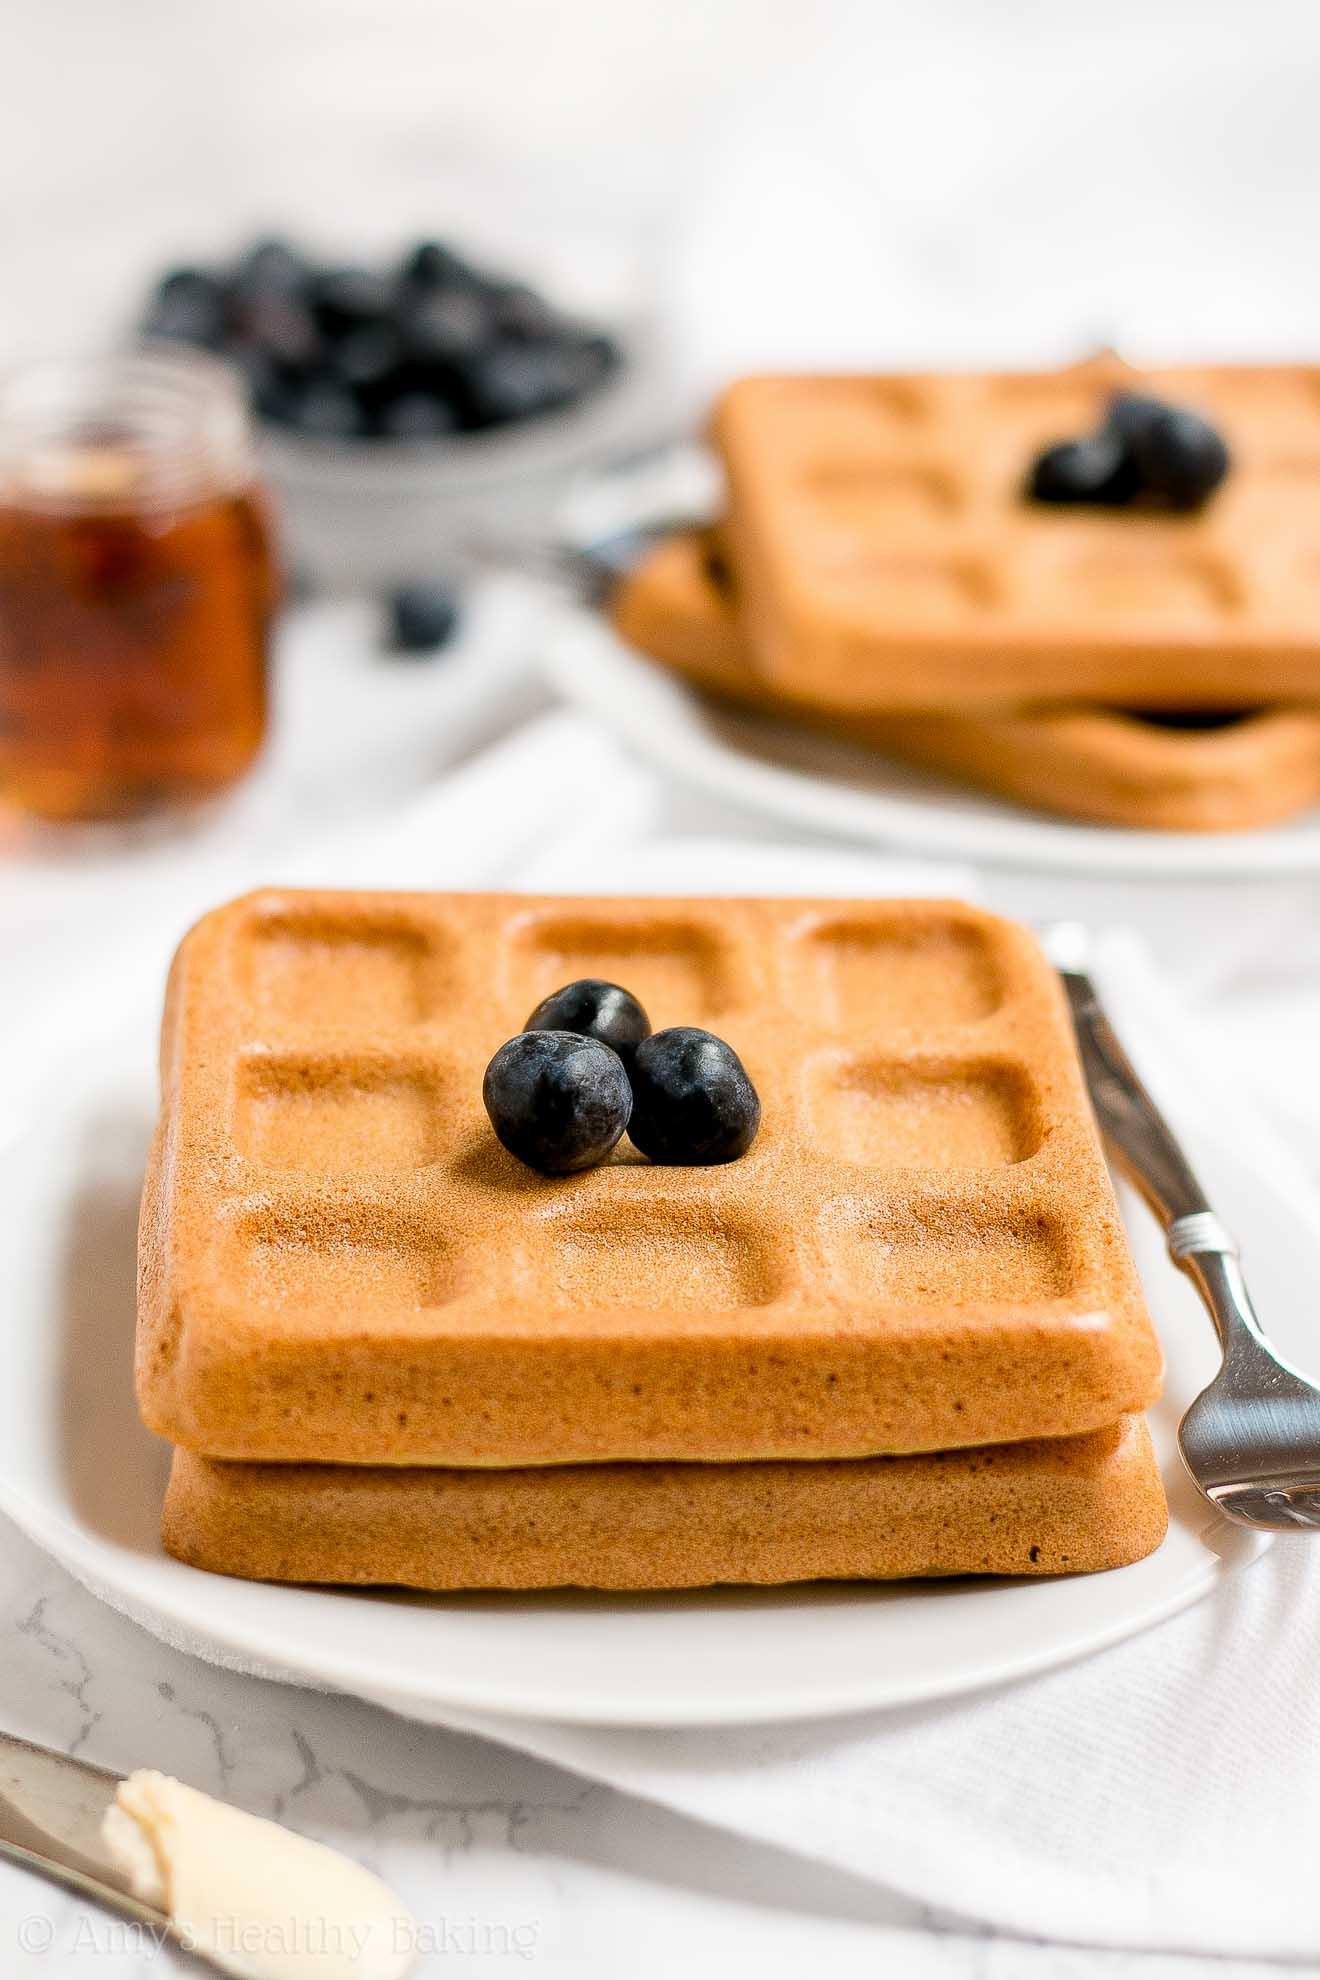 BEST Healthy Baked Buttermilk Waffles made with greek yogurt